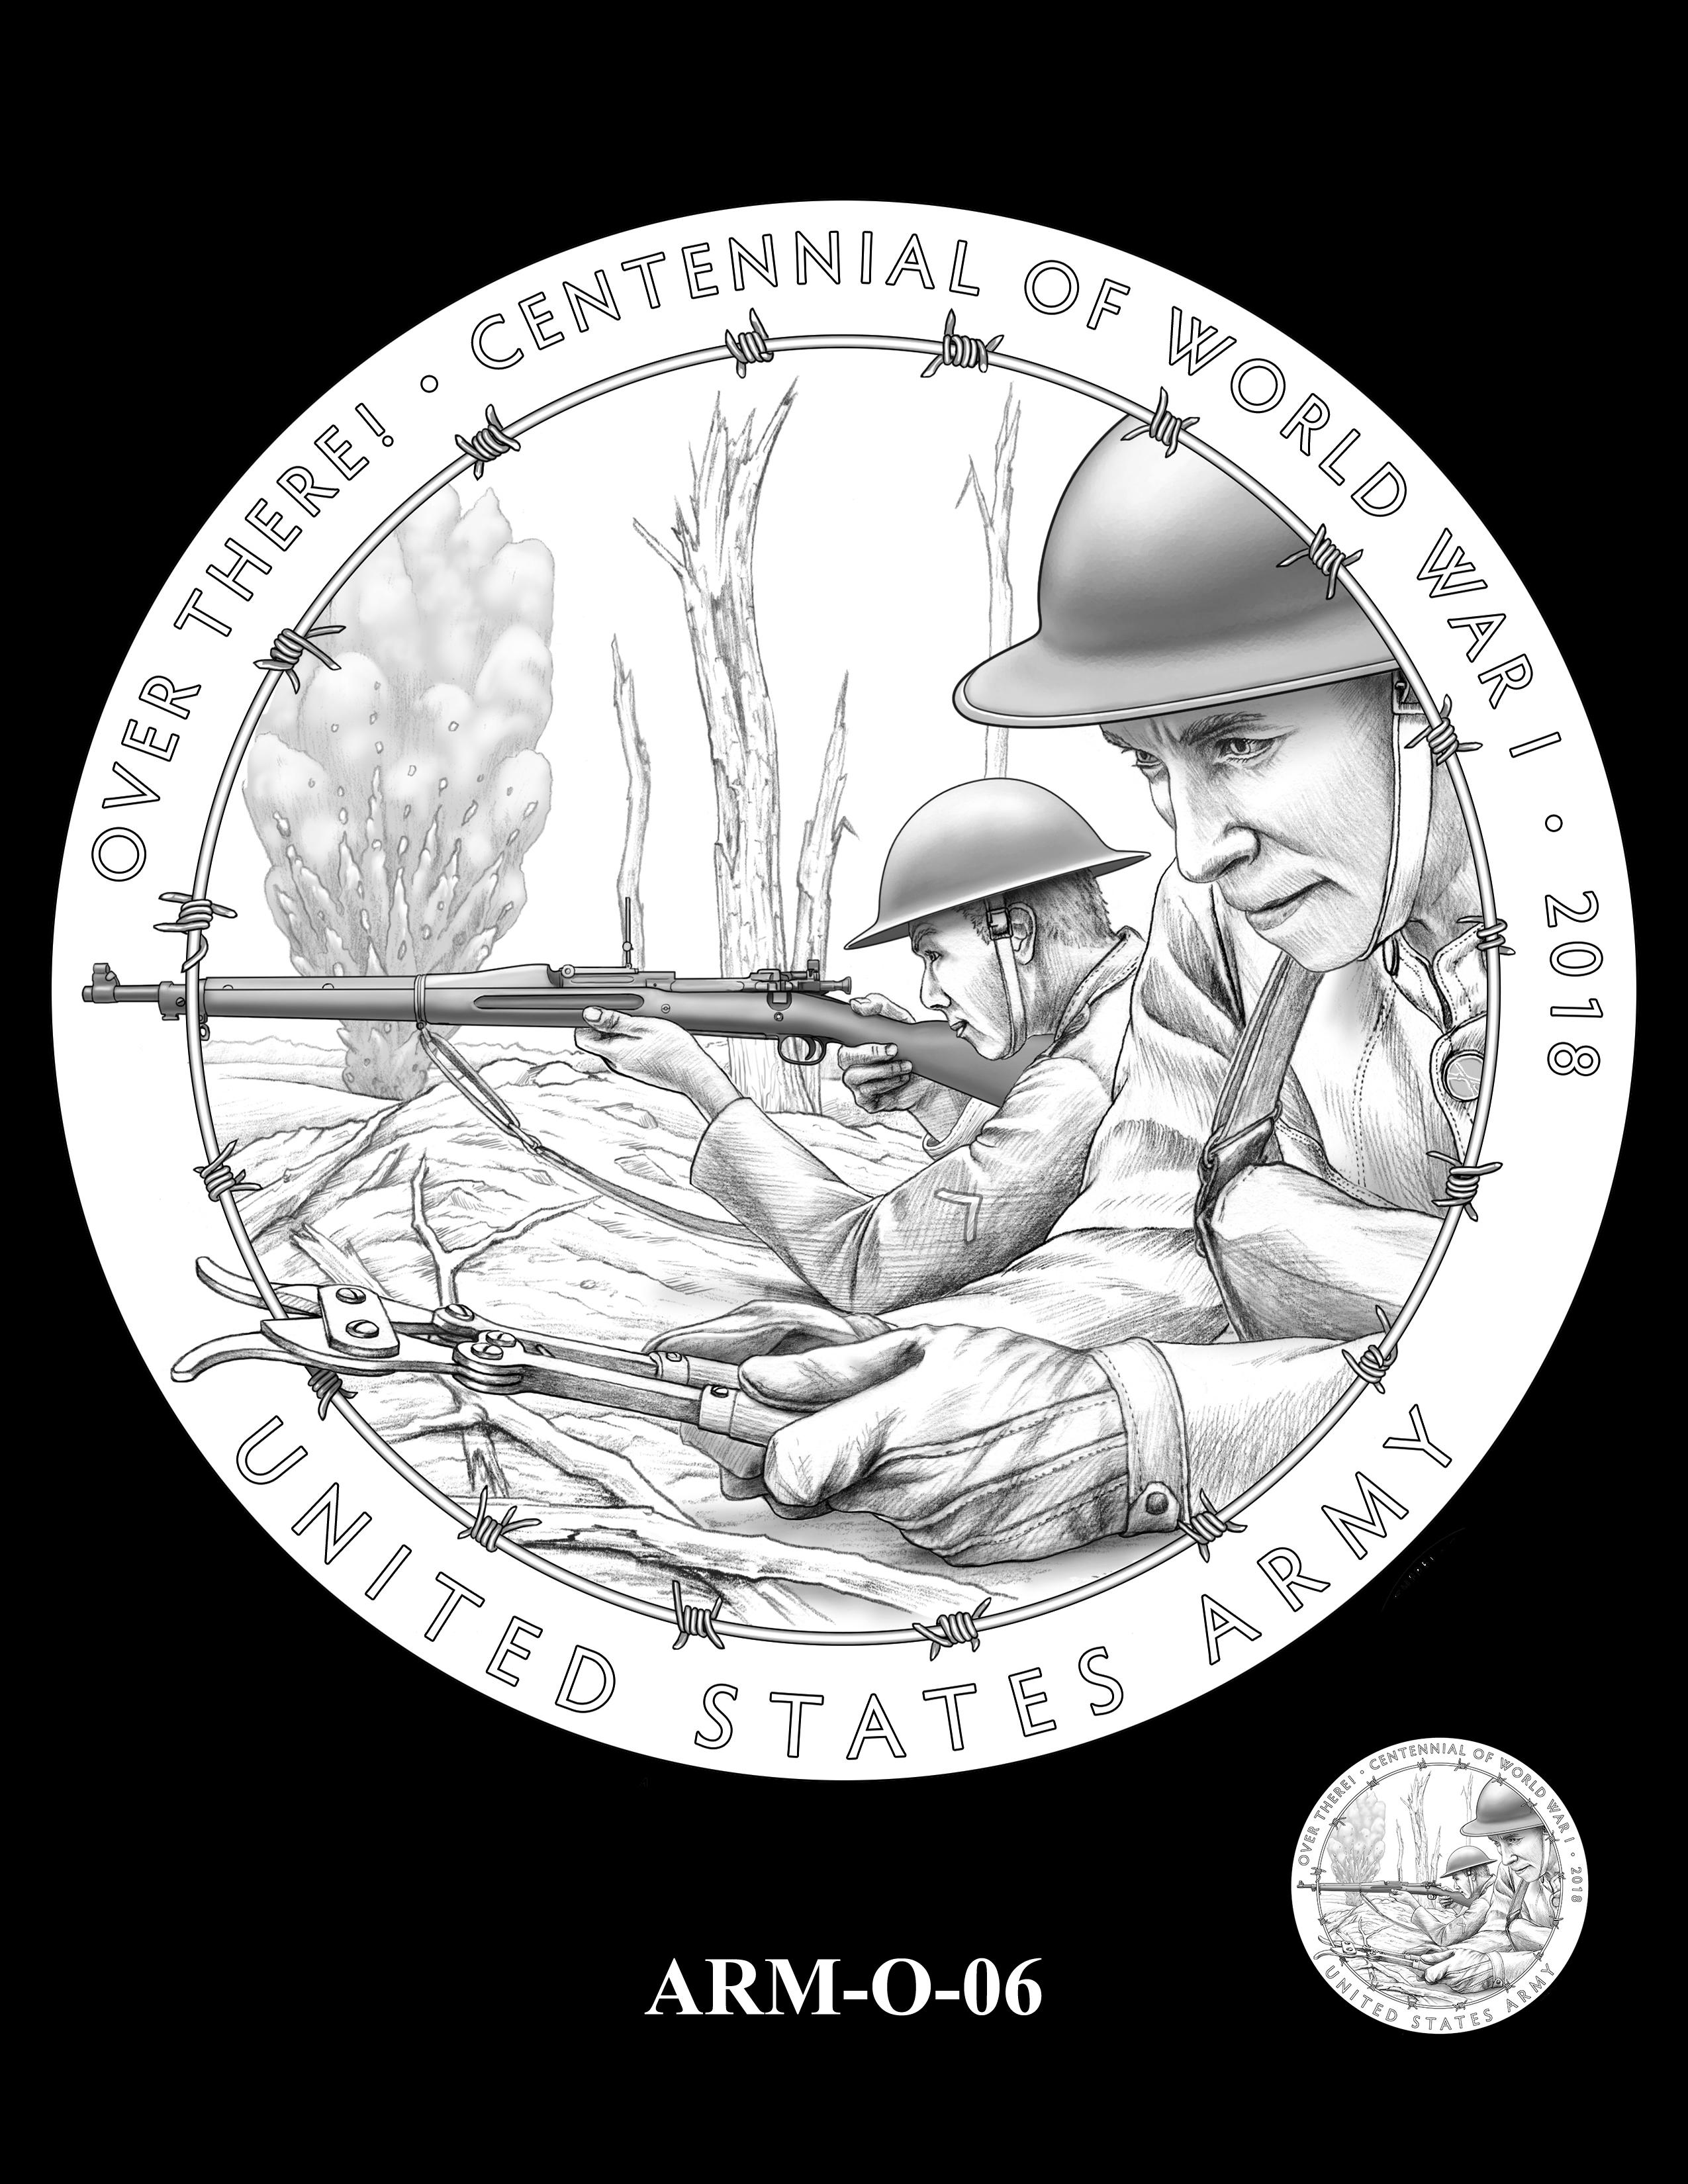 P1-ARM-O-06 -- 2018-World War I Silver Medals - Army